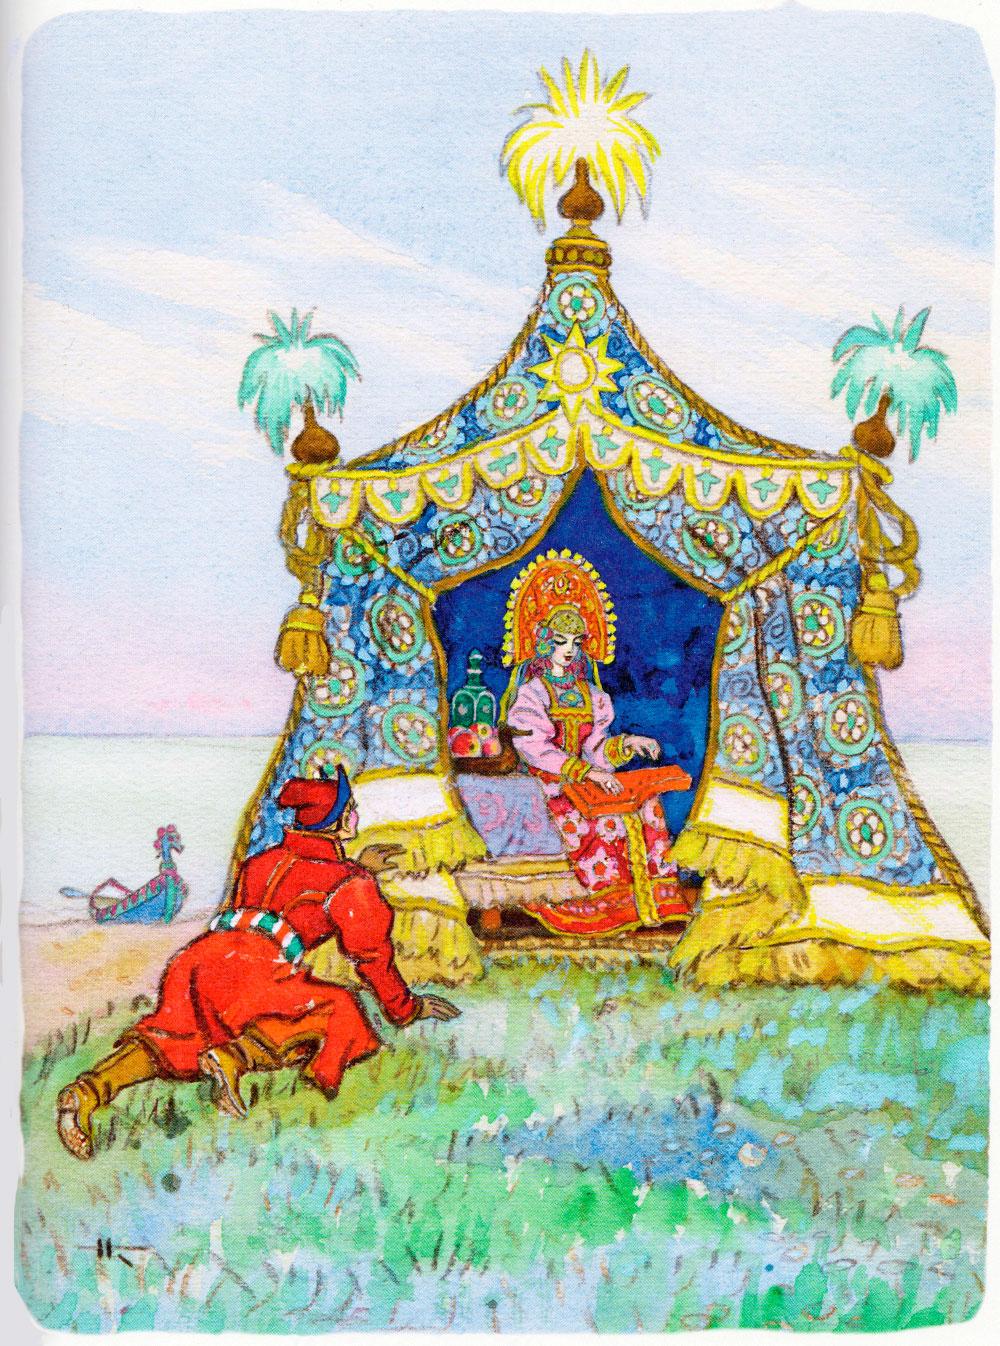 Царь-девица в шатре